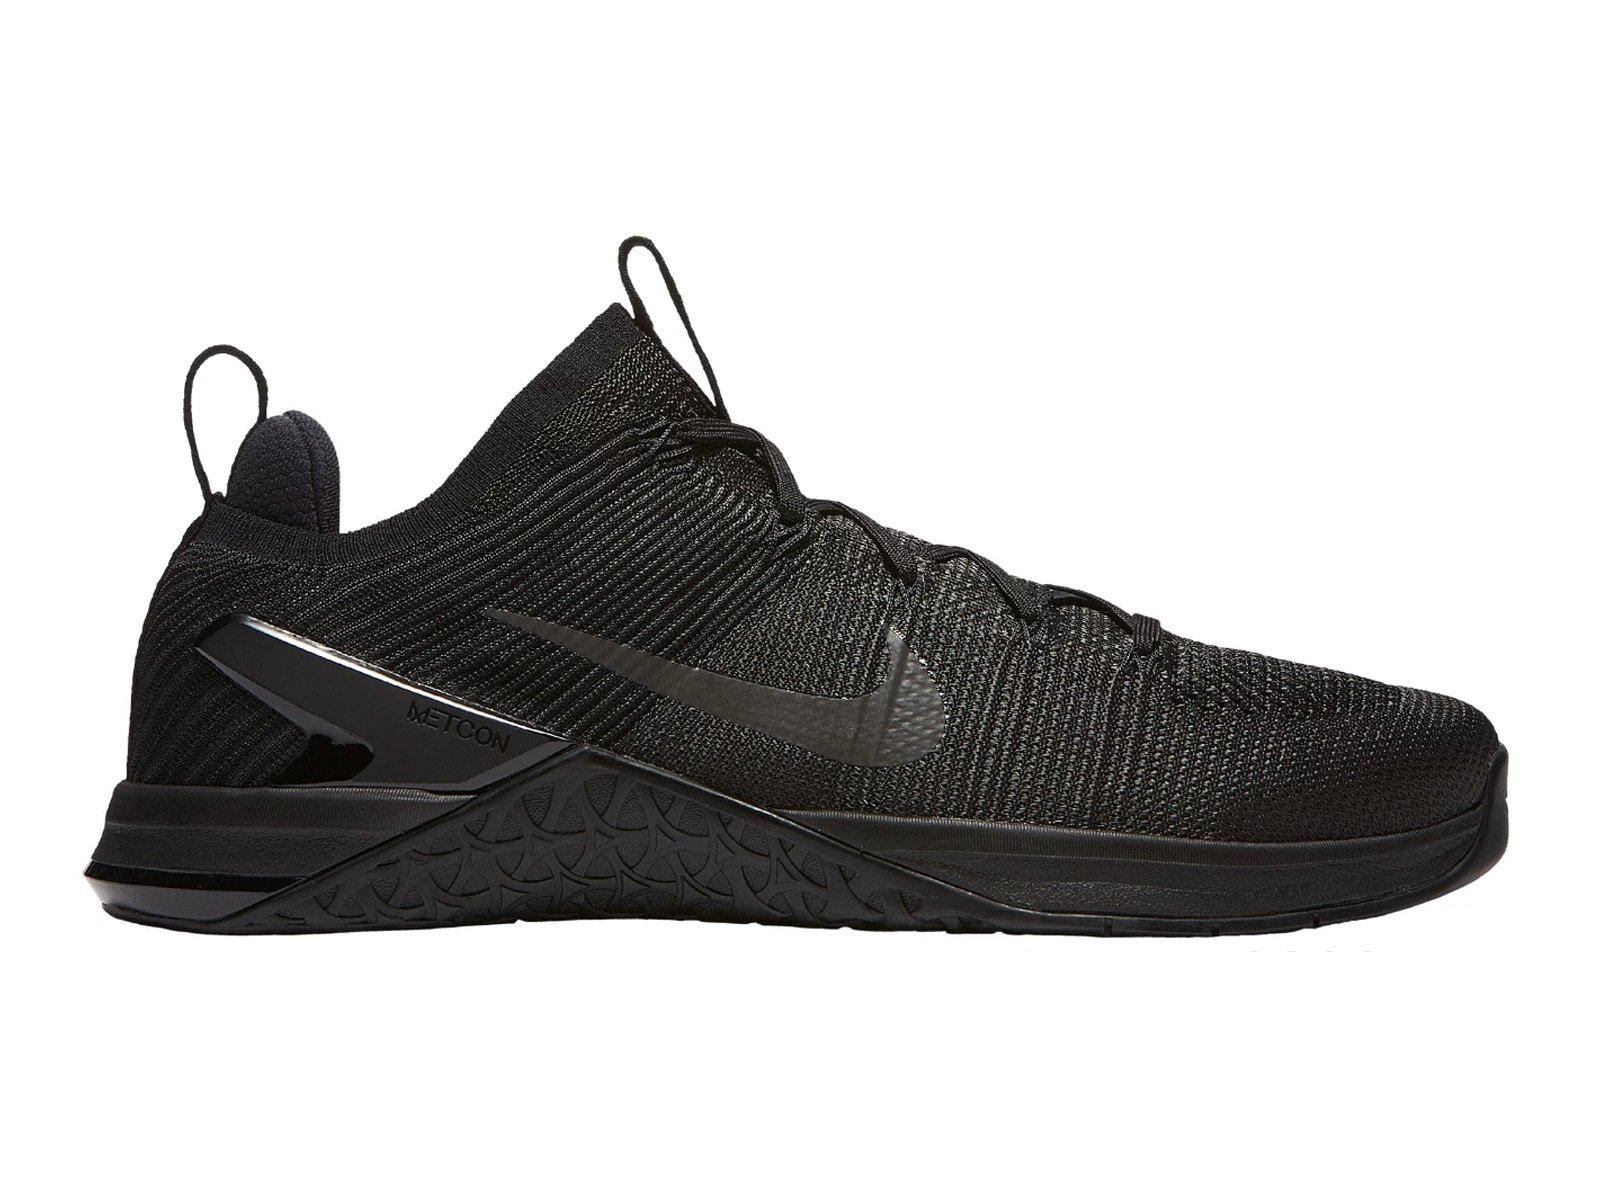 22735369bede40 Galleon - Nike Men s Metcon DSX Flyknit 2 Black Black Black Nylon Running  Shoes 11.5 D(M) US